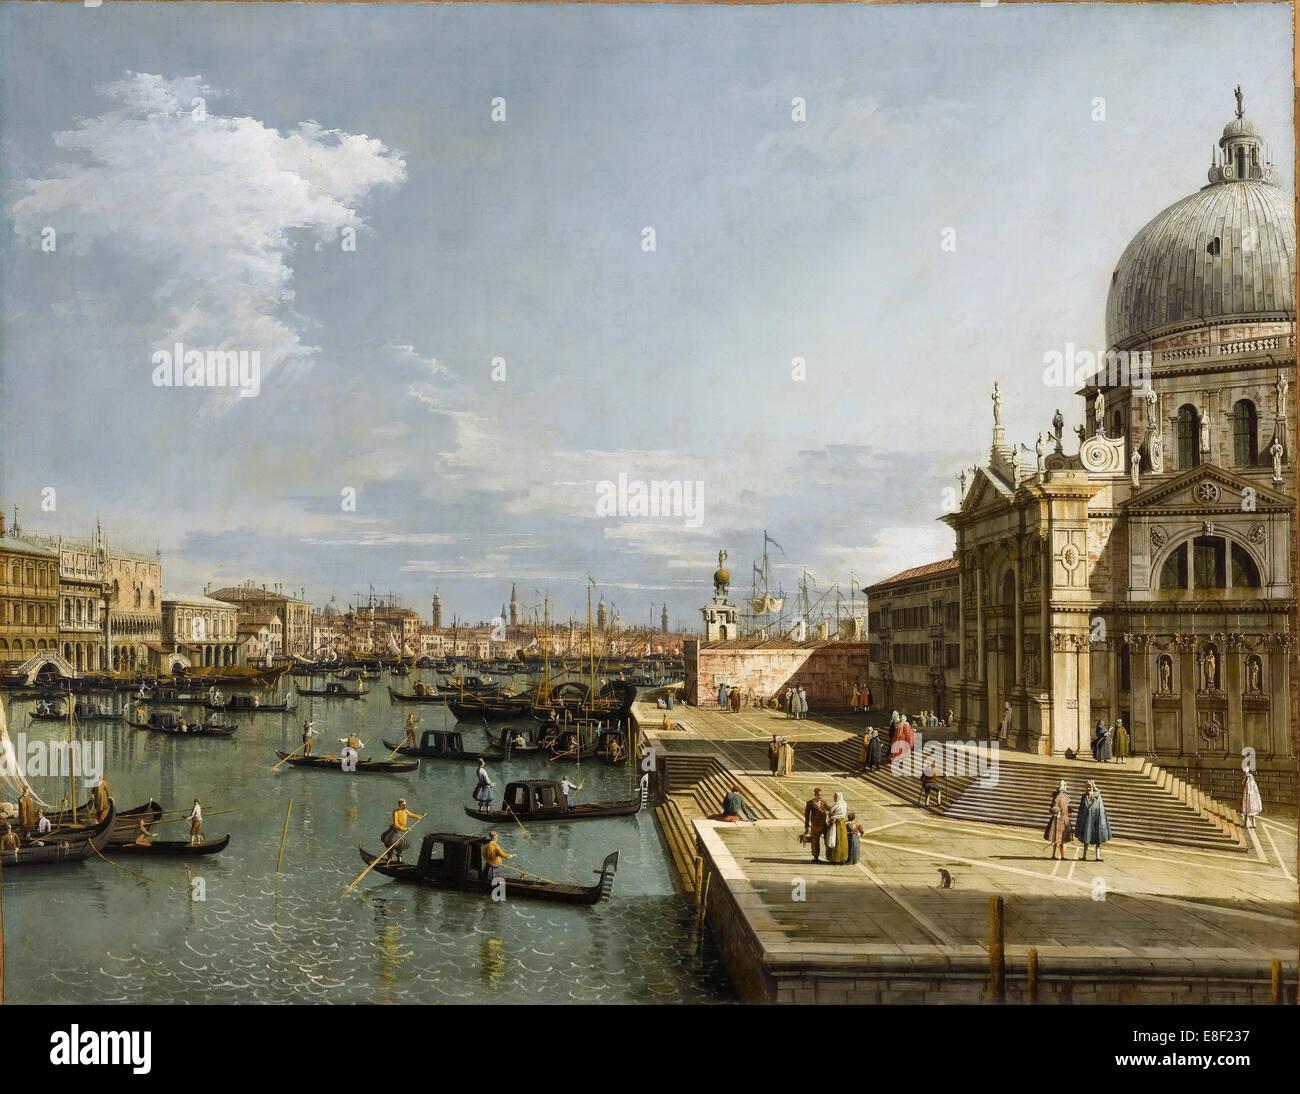 The Entrance to the Grand Canal and the Church Santa Maria della Salute, Venice. Artist: Canaletto (1697-1768) - Stock Image